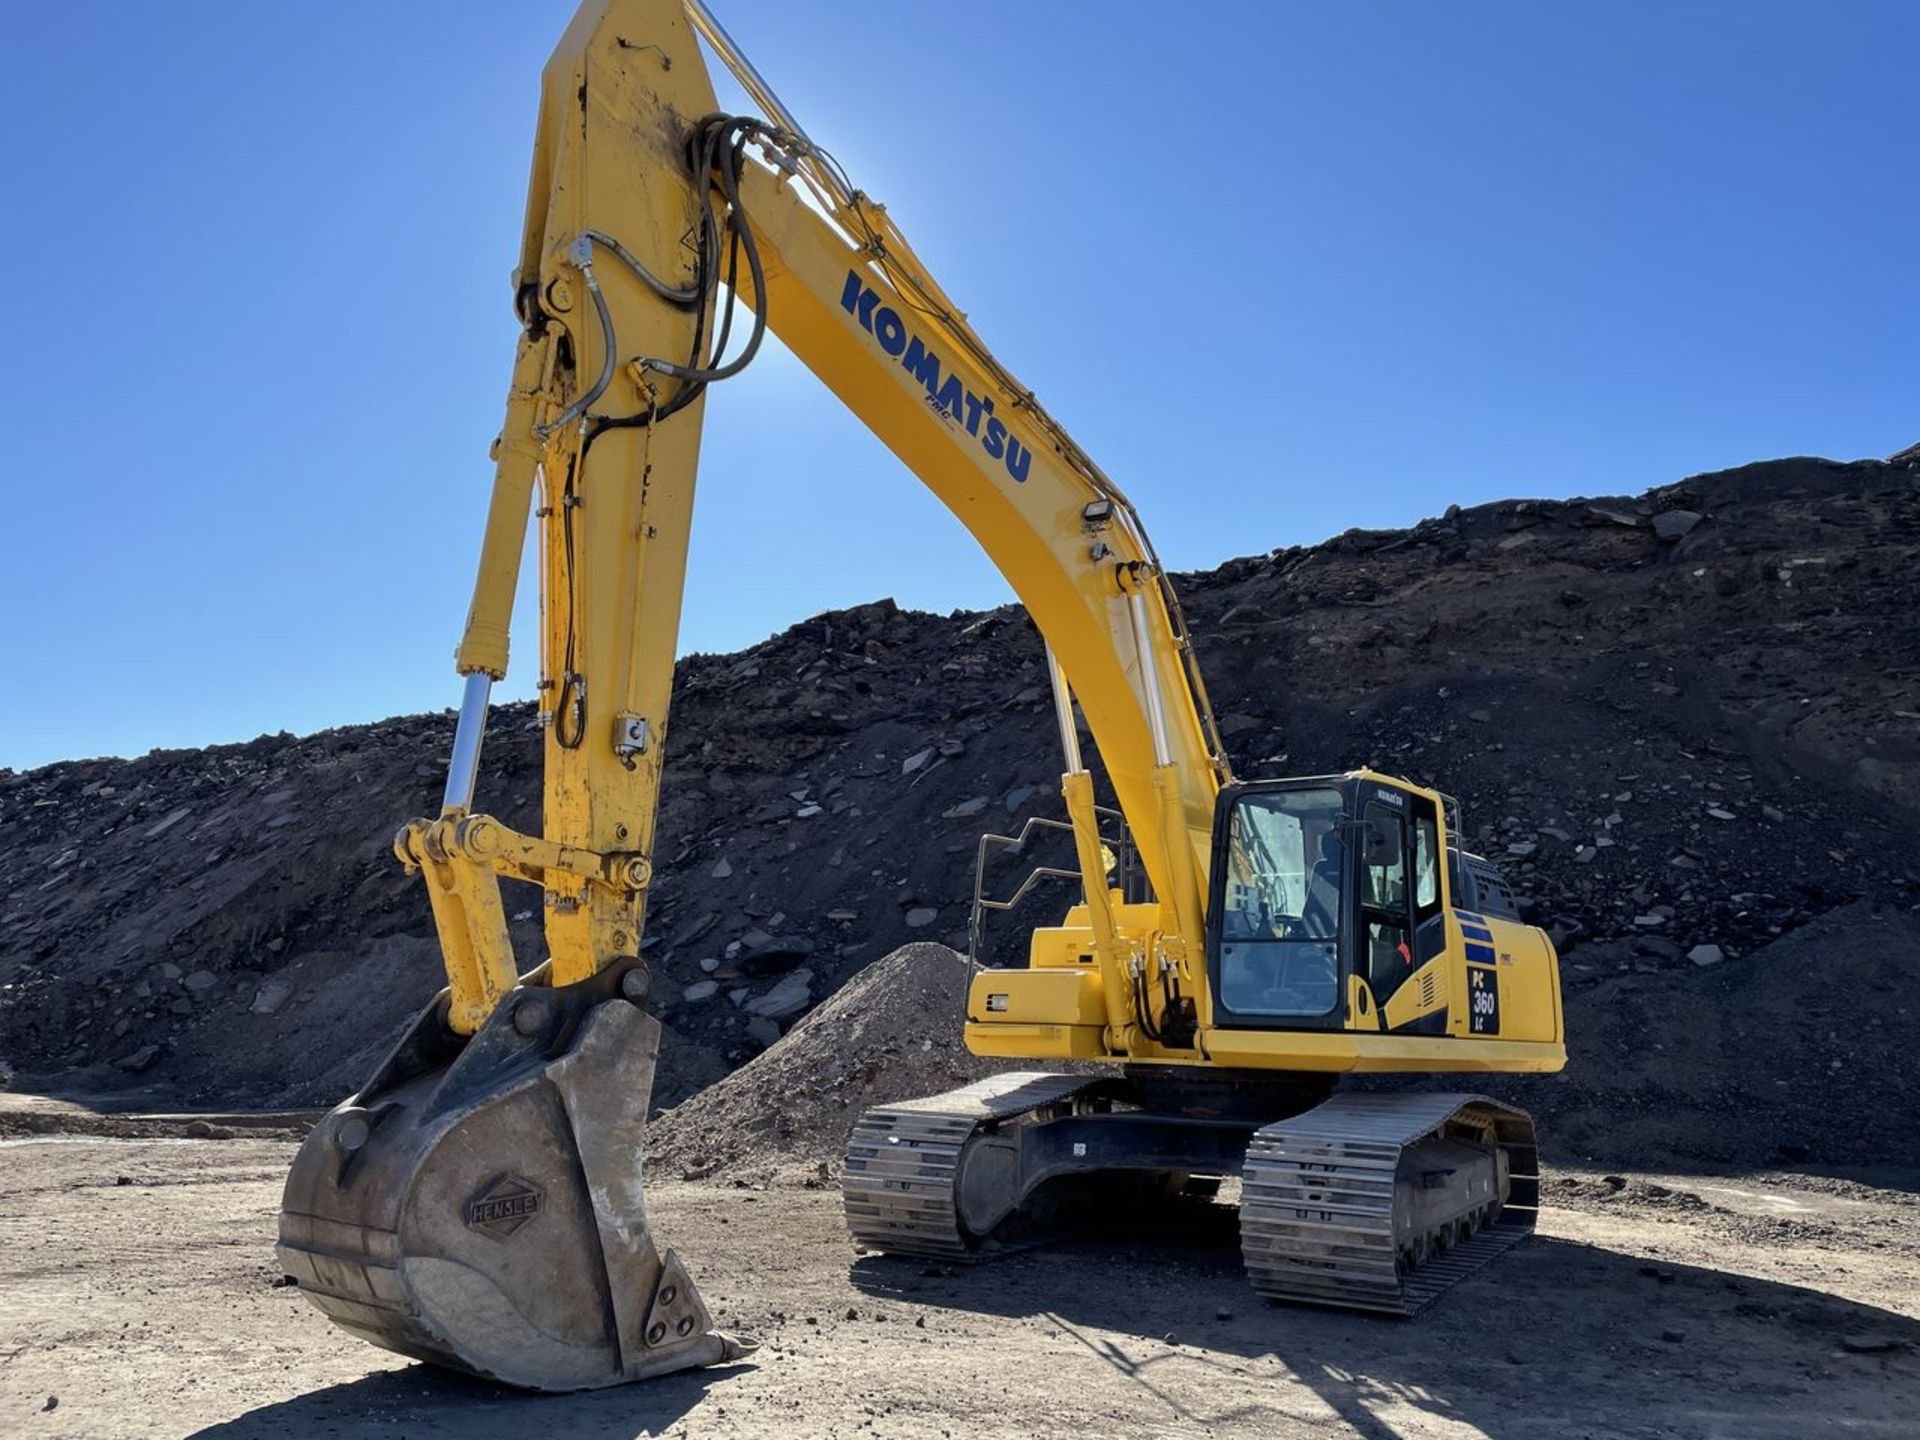 2018 Komatsu PC360LC-11 Hydraulic Crawler Excavator, S/N: A36863, PIN: KMTPC256CJWA36863; with 2,883